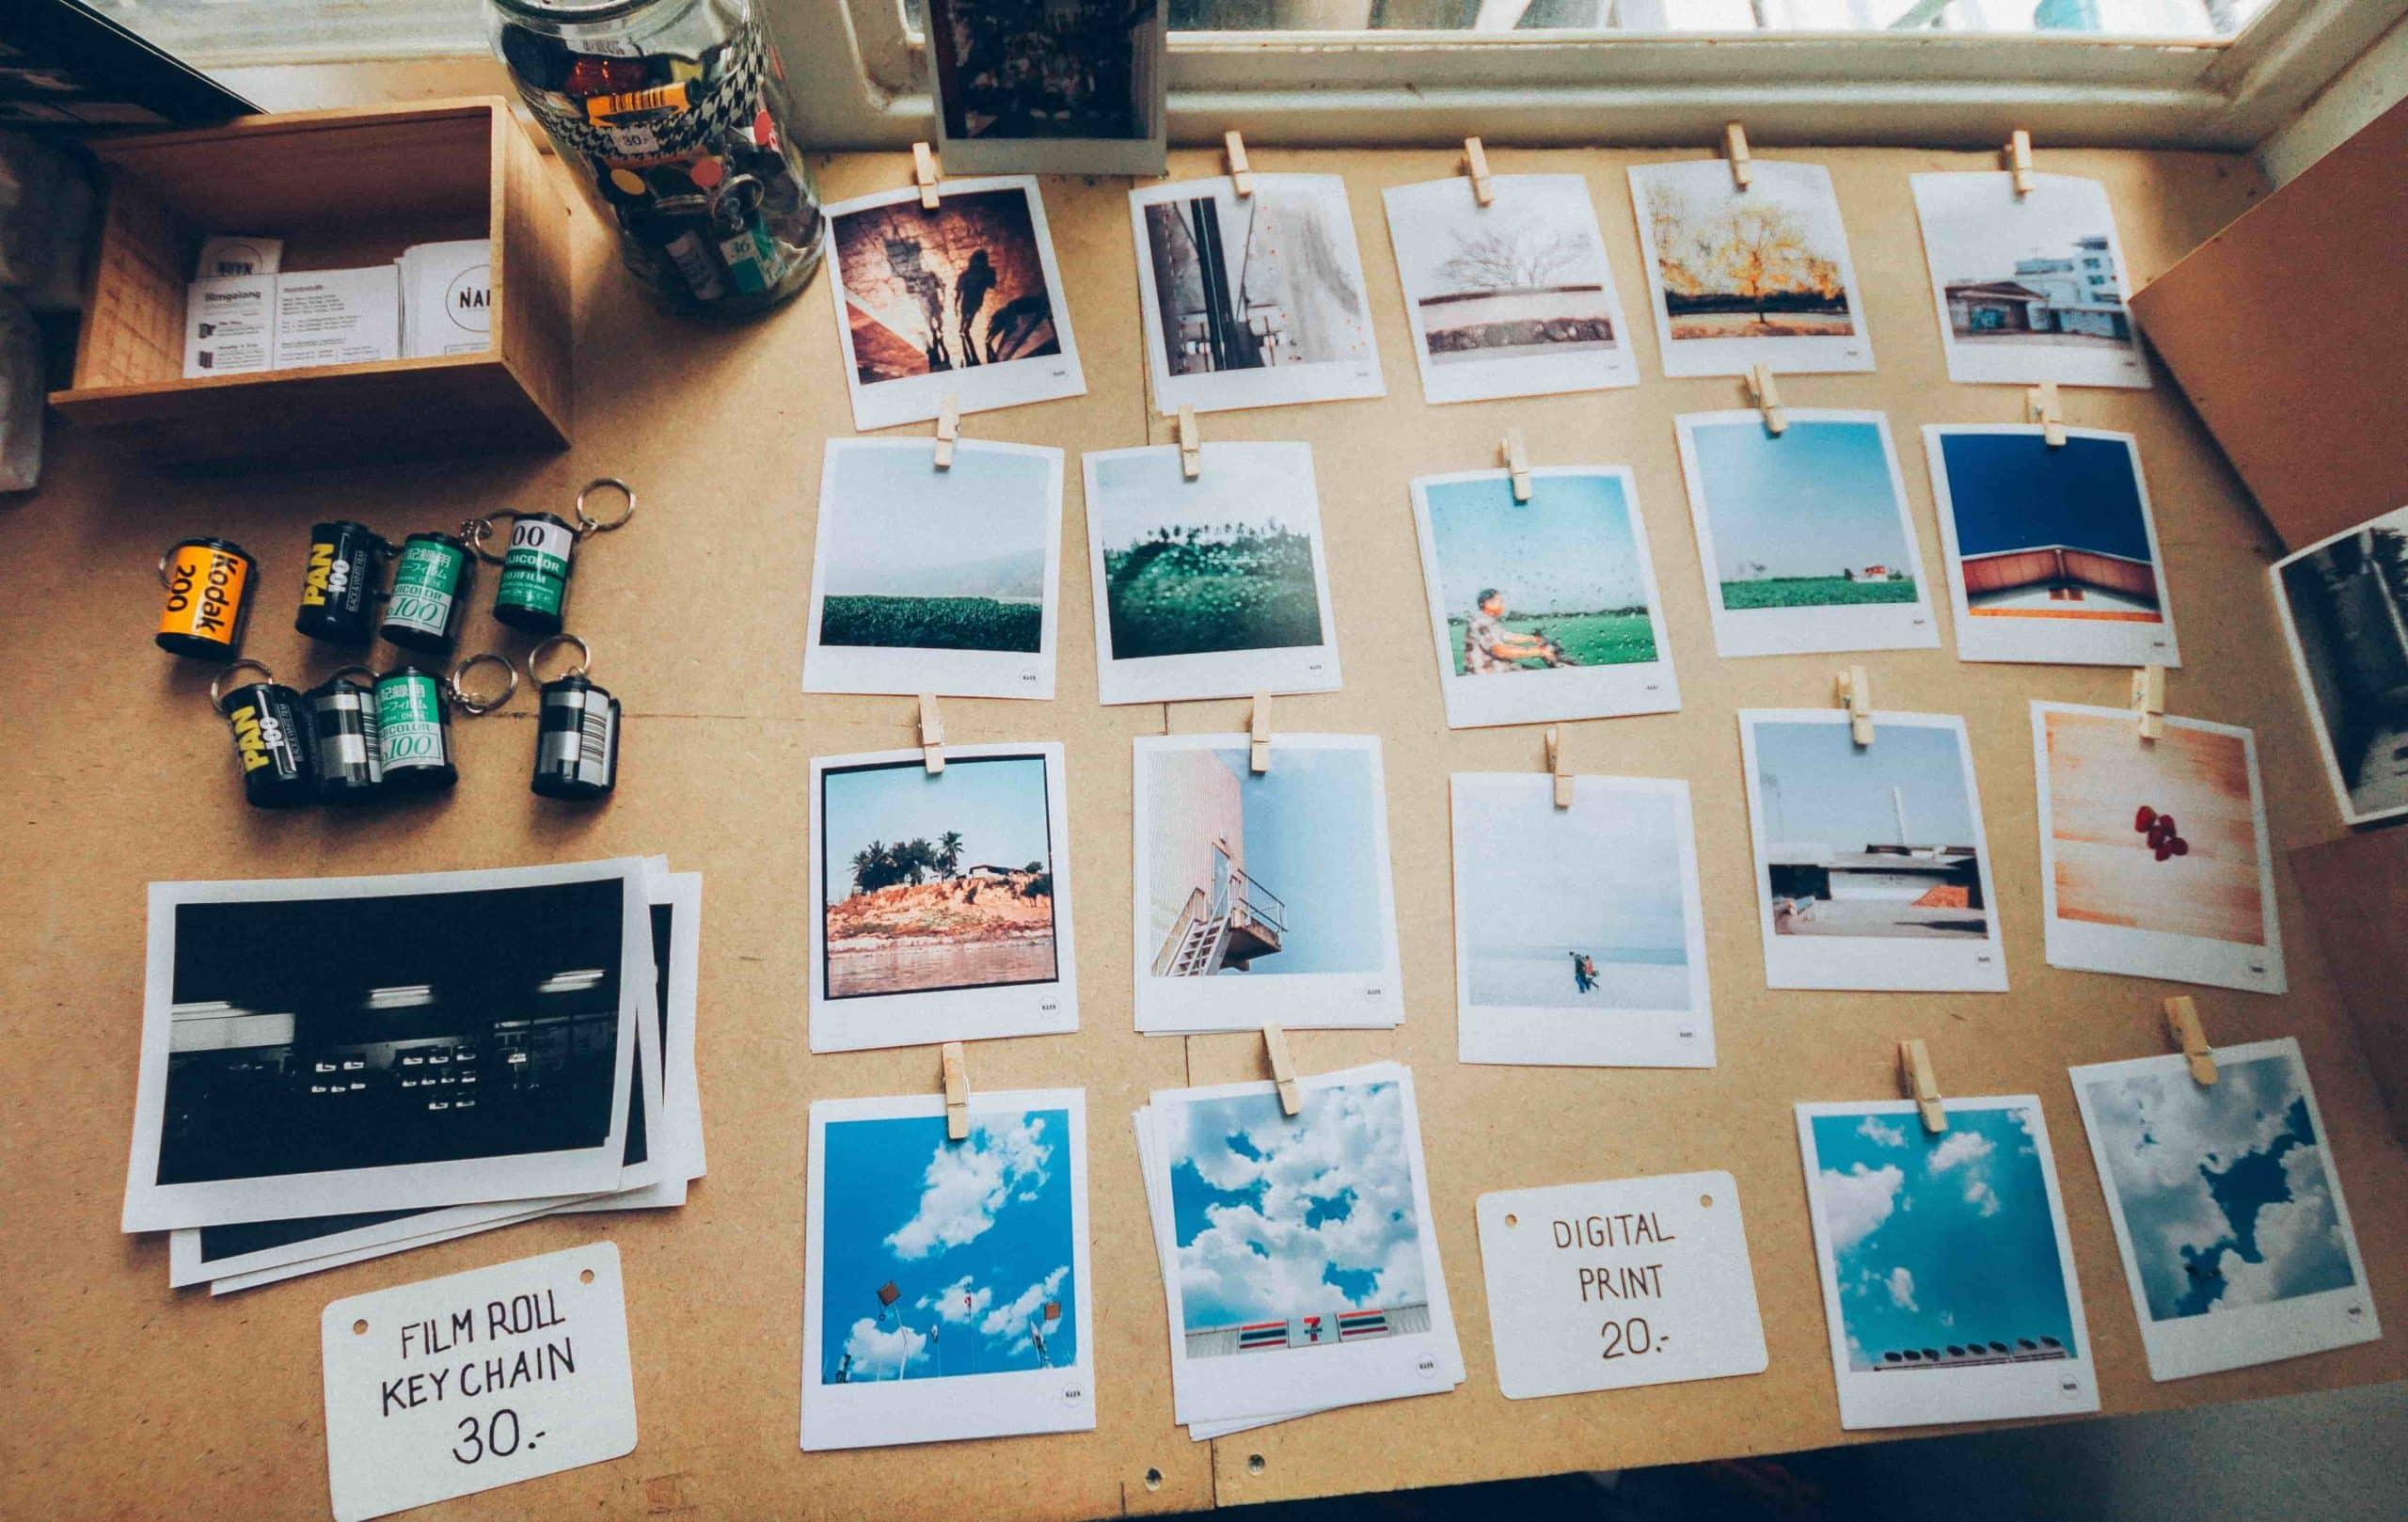 Duplicate photo finder software